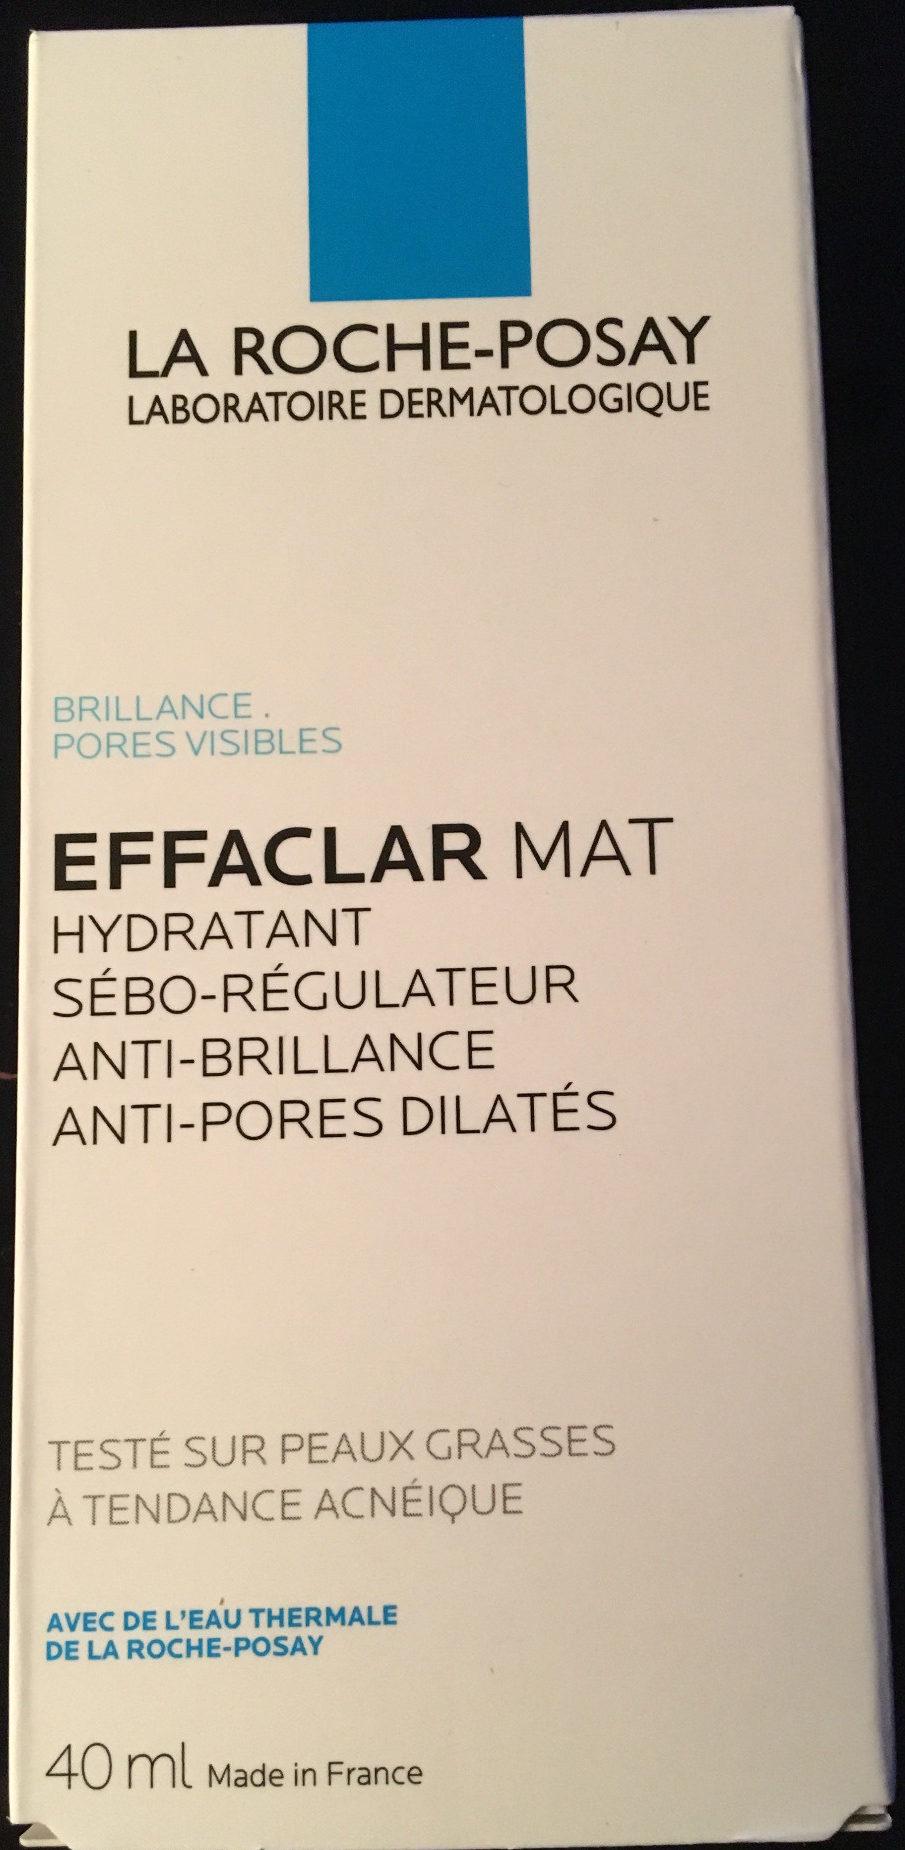 La Roche Posay - Effaclar Mat - Product - fr